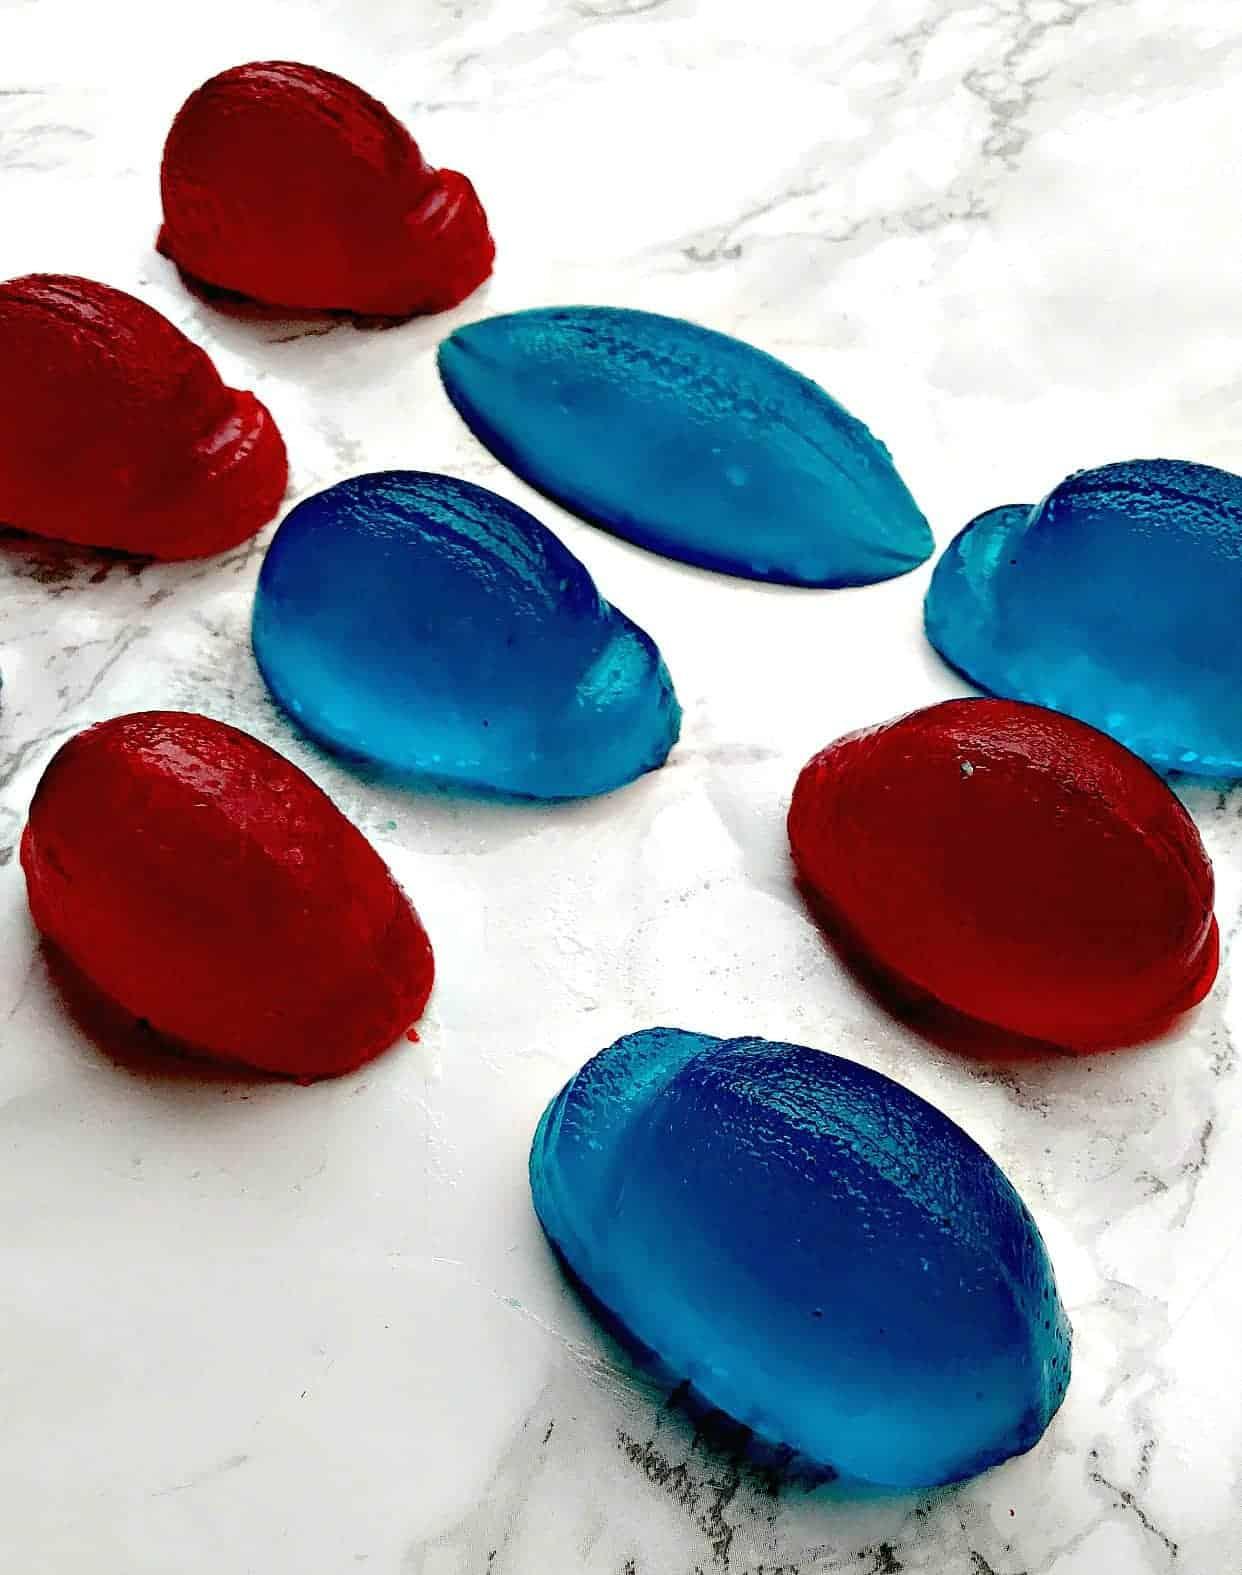 super bowl red and blue jello mold shots (footballs, & helmets)